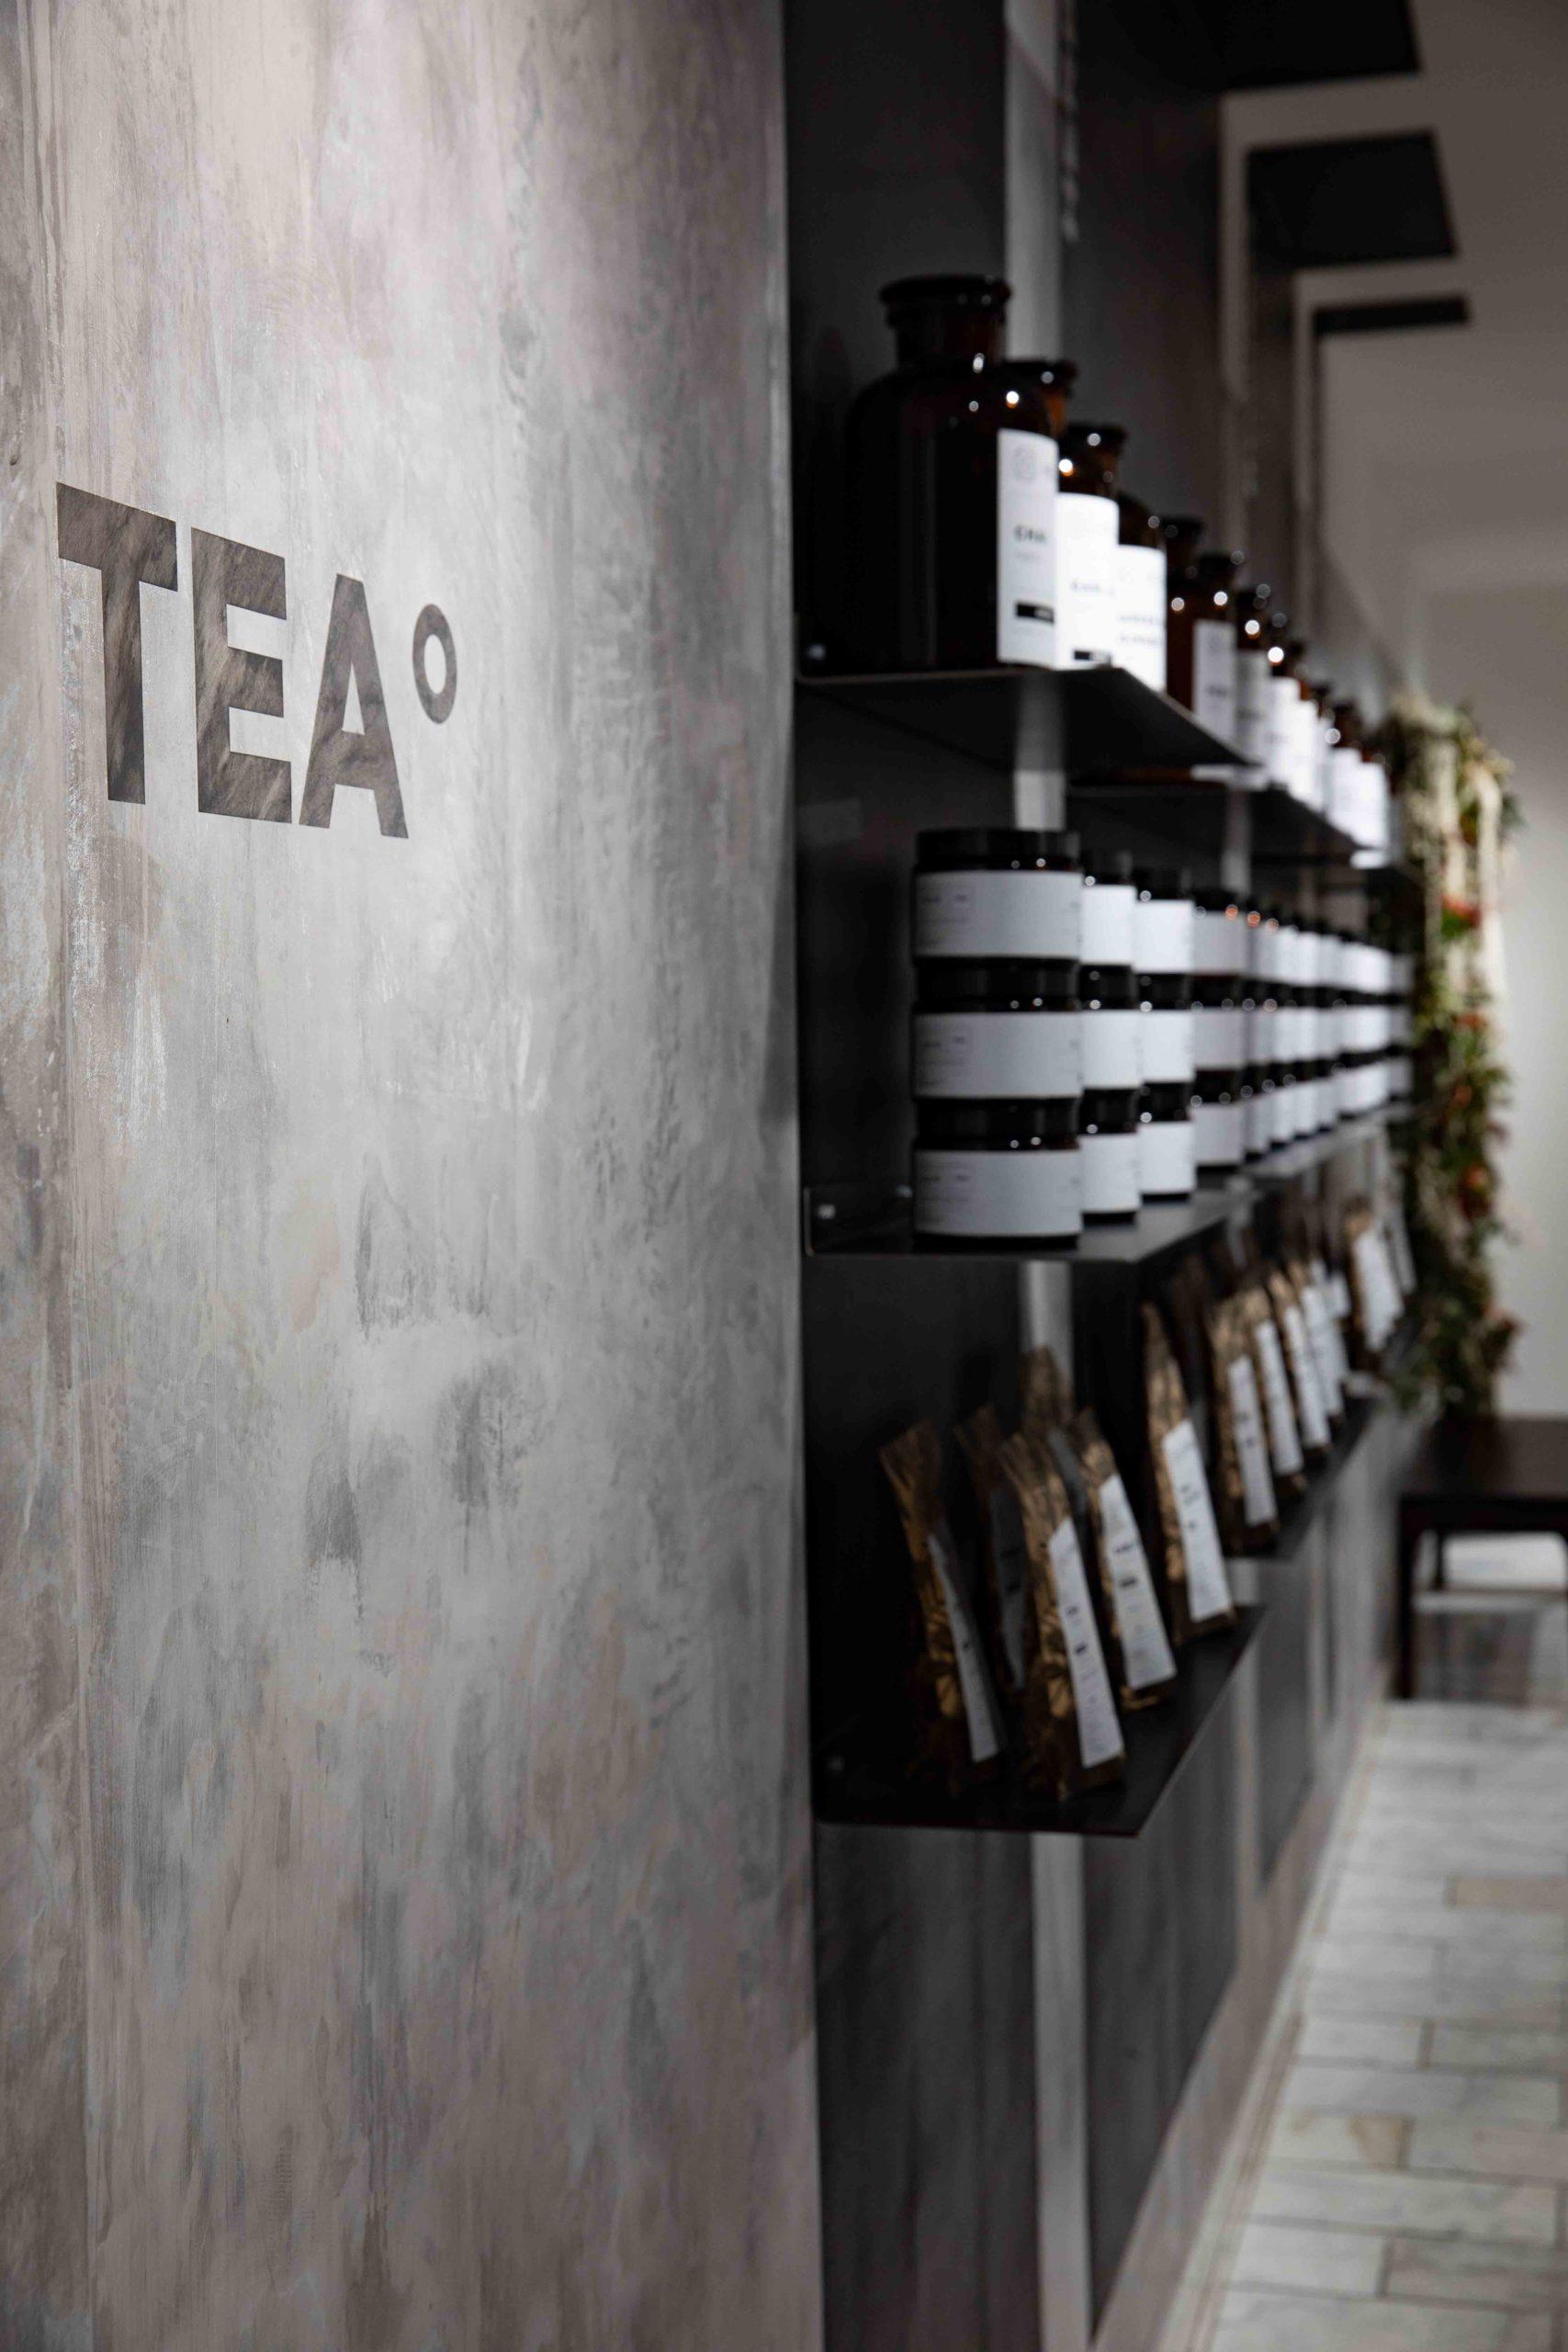 Hellers Tea Shop Teeregale Nobla Innenarchitektur